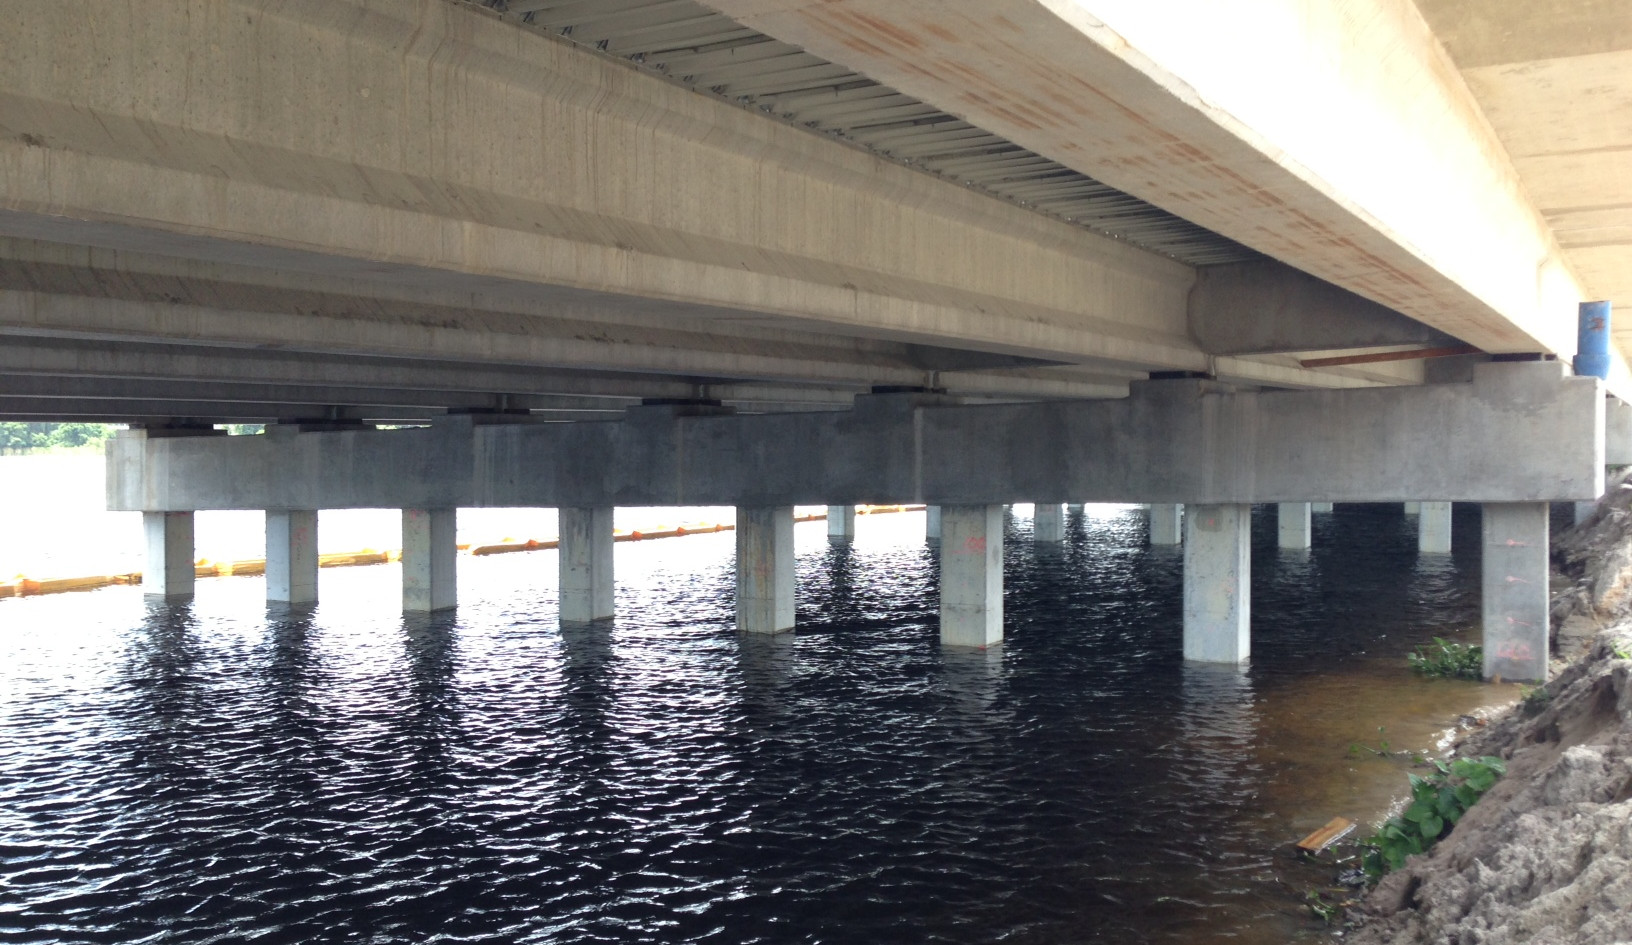 SR 50 over Lake Lotta - CSI